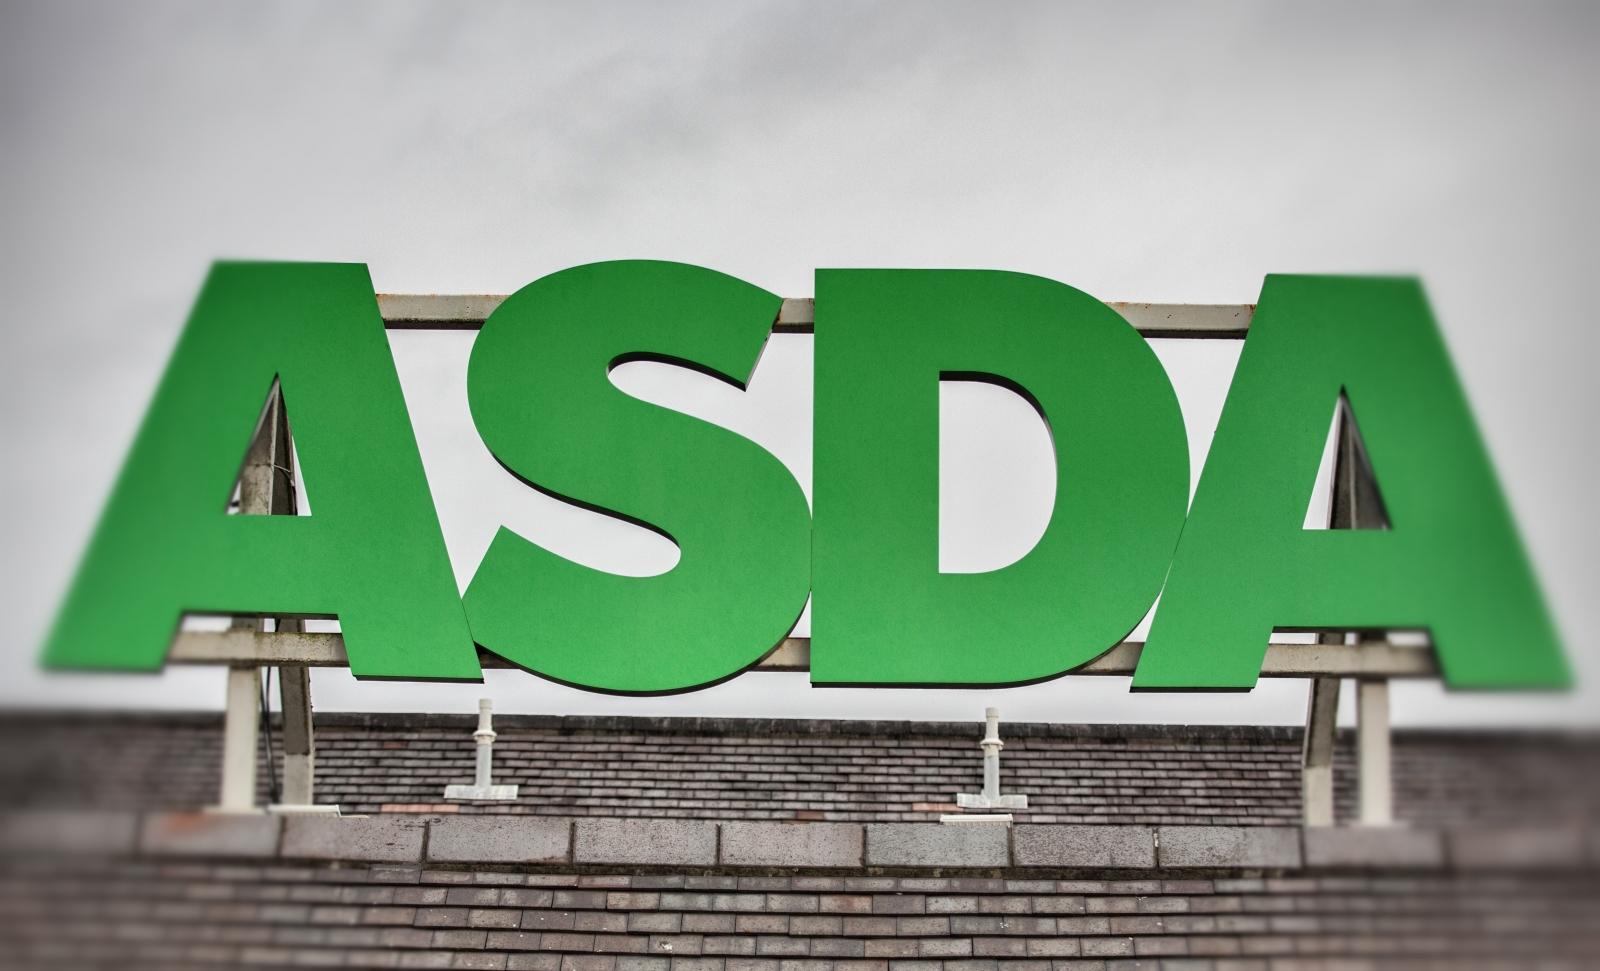 Asda supermarket sign